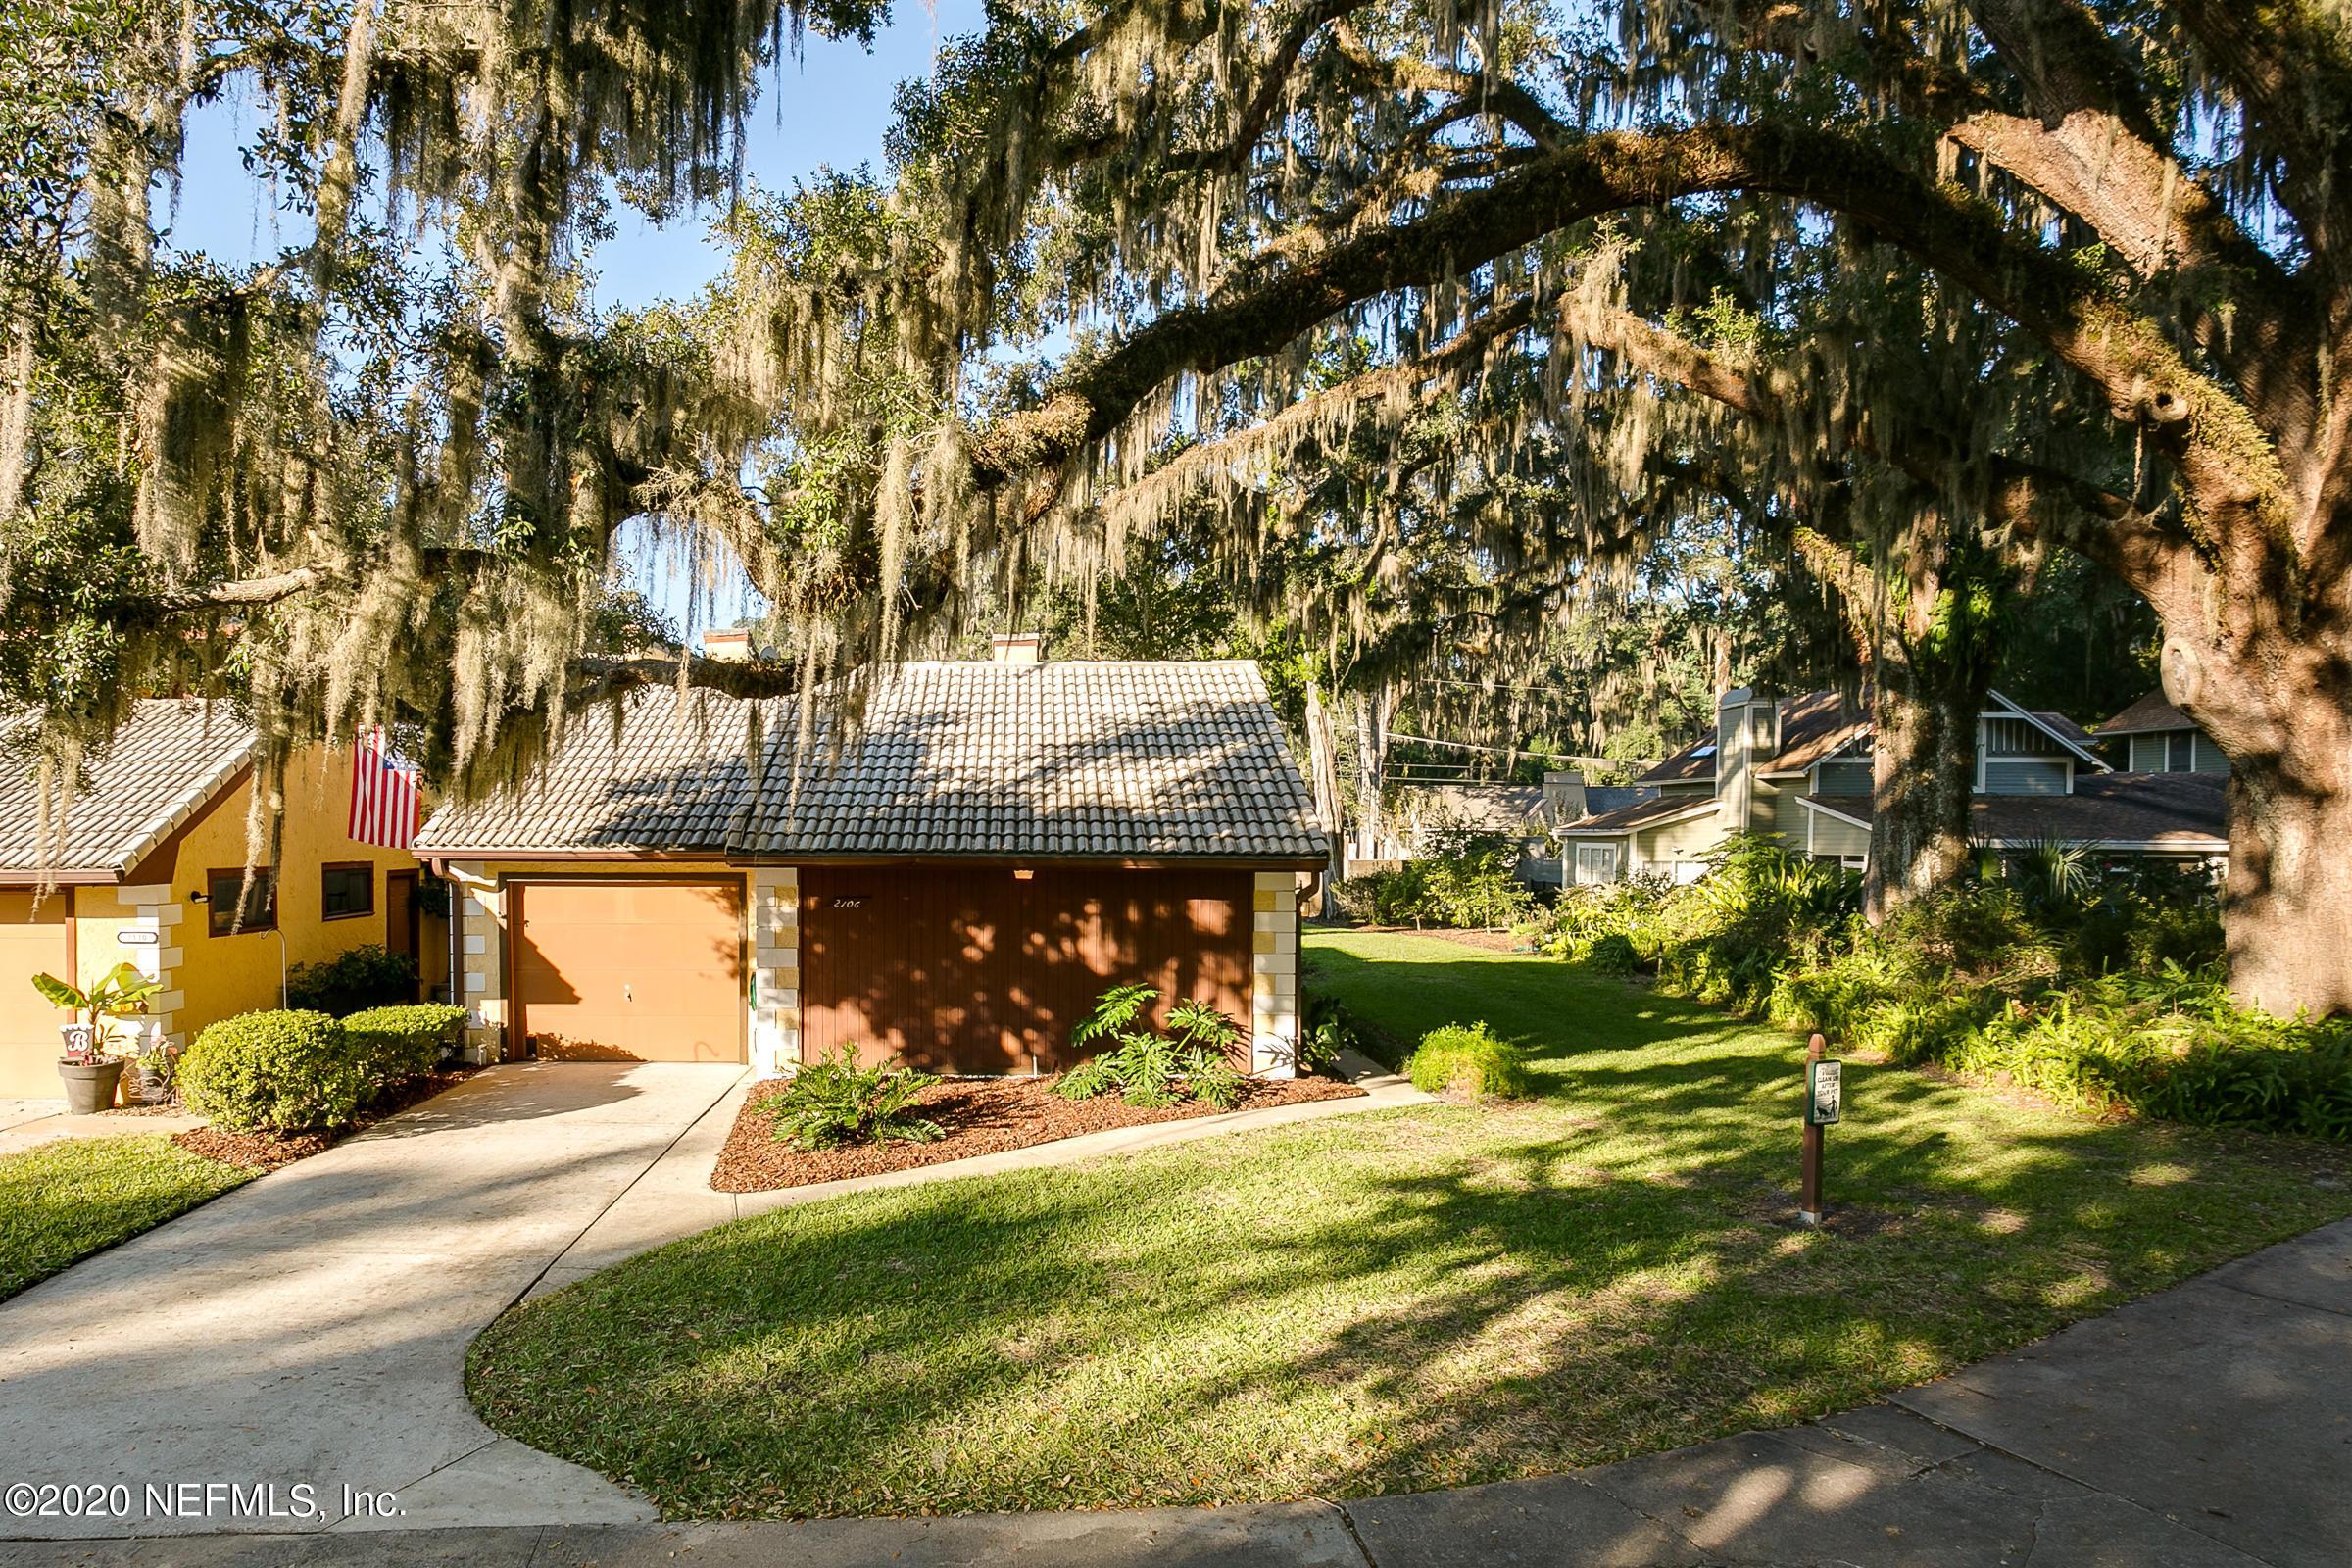 2106 WINTERBOURNE, ORANGE PARK, FLORIDA 32073, 2 Bedrooms Bedrooms, ,2 BathroomsBathrooms,Residential,For sale,WINTERBOURNE,1086085